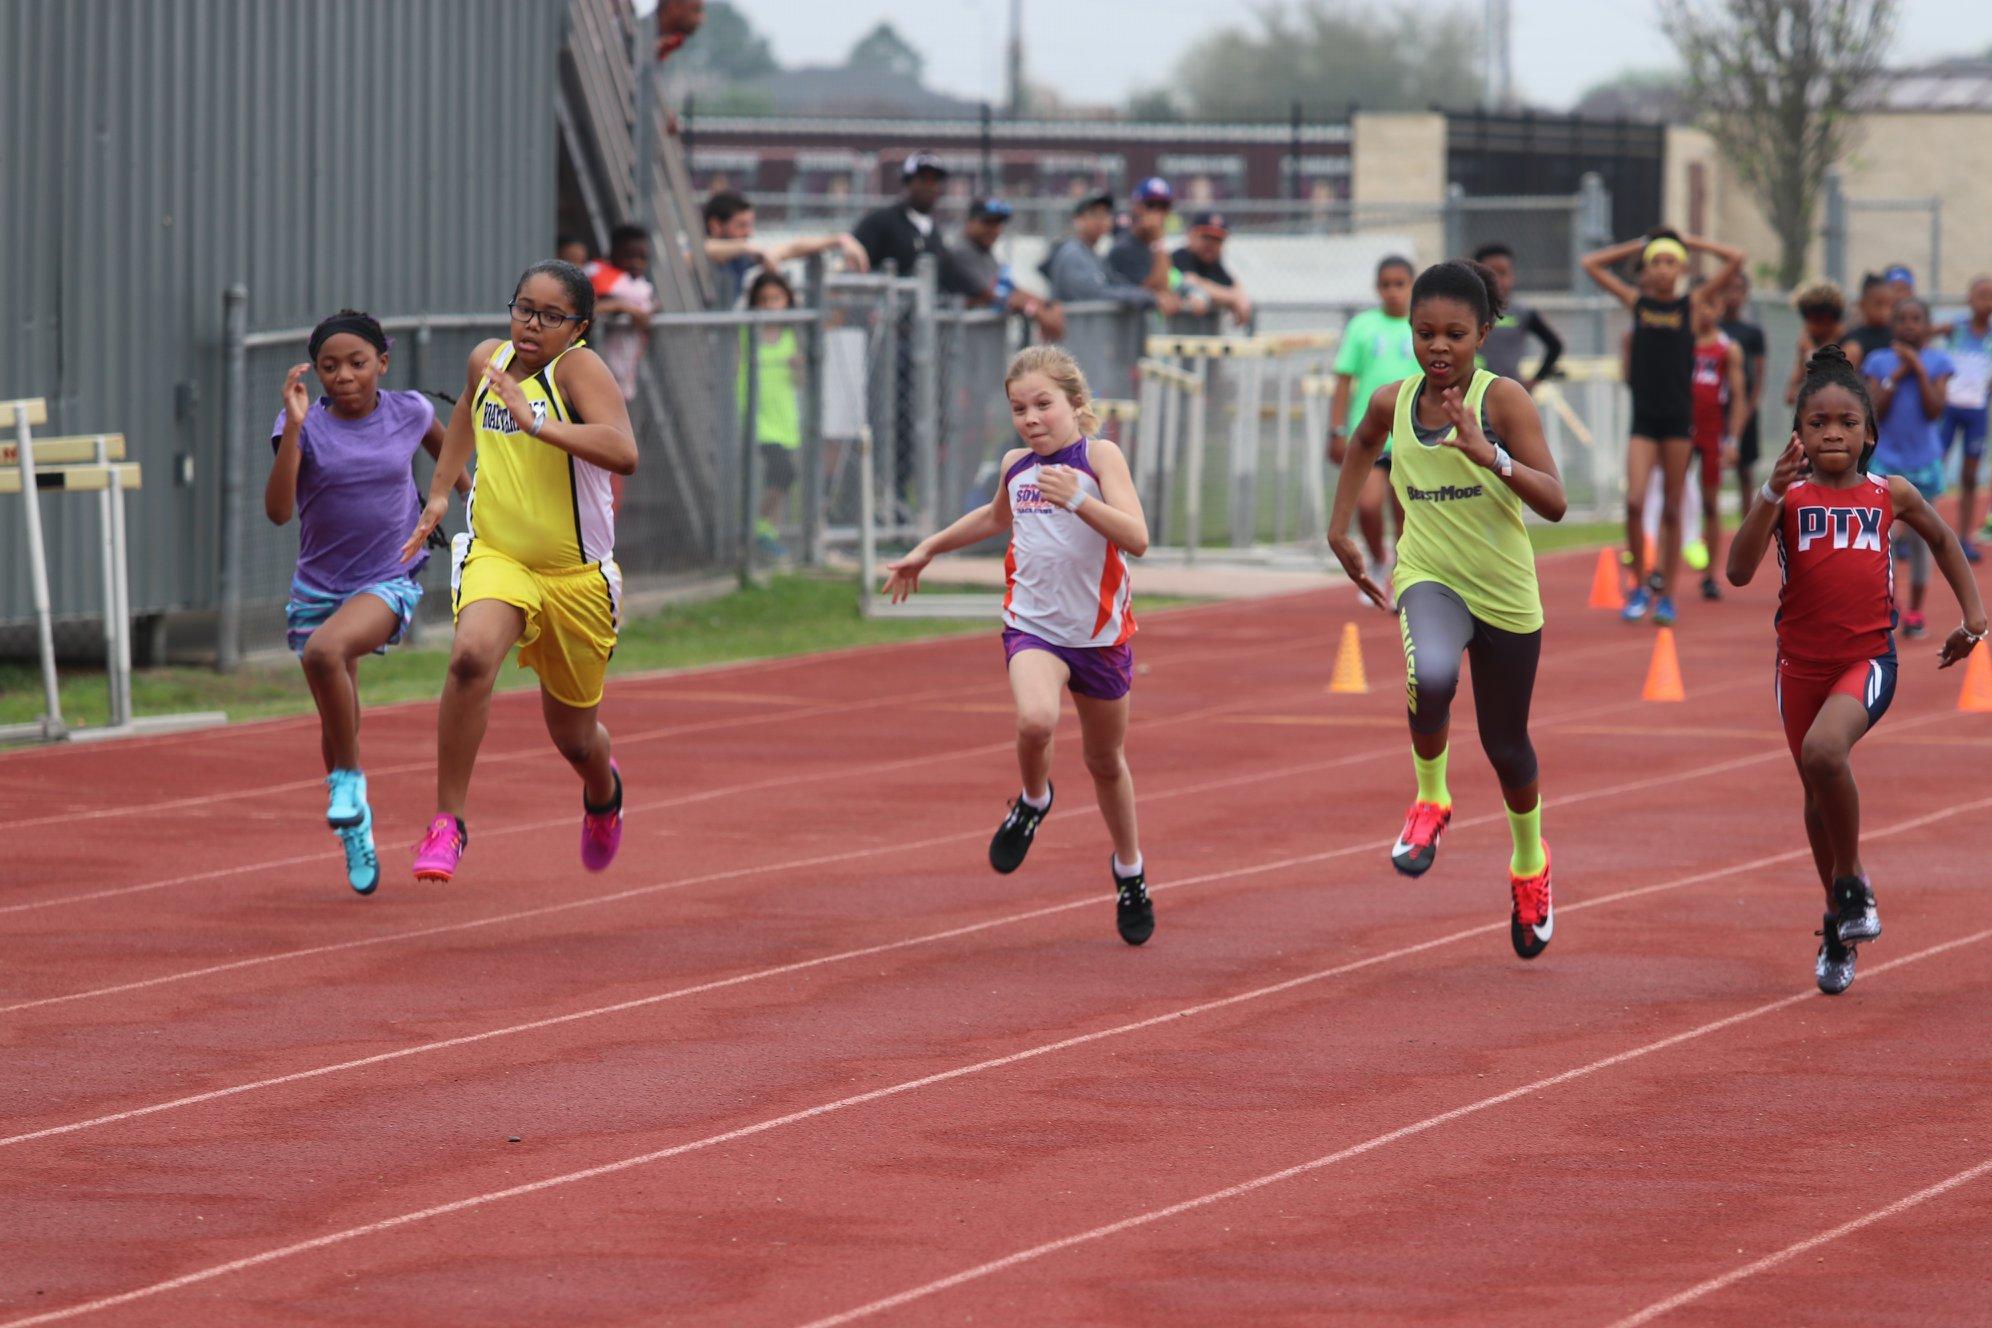 Macyn running the 100